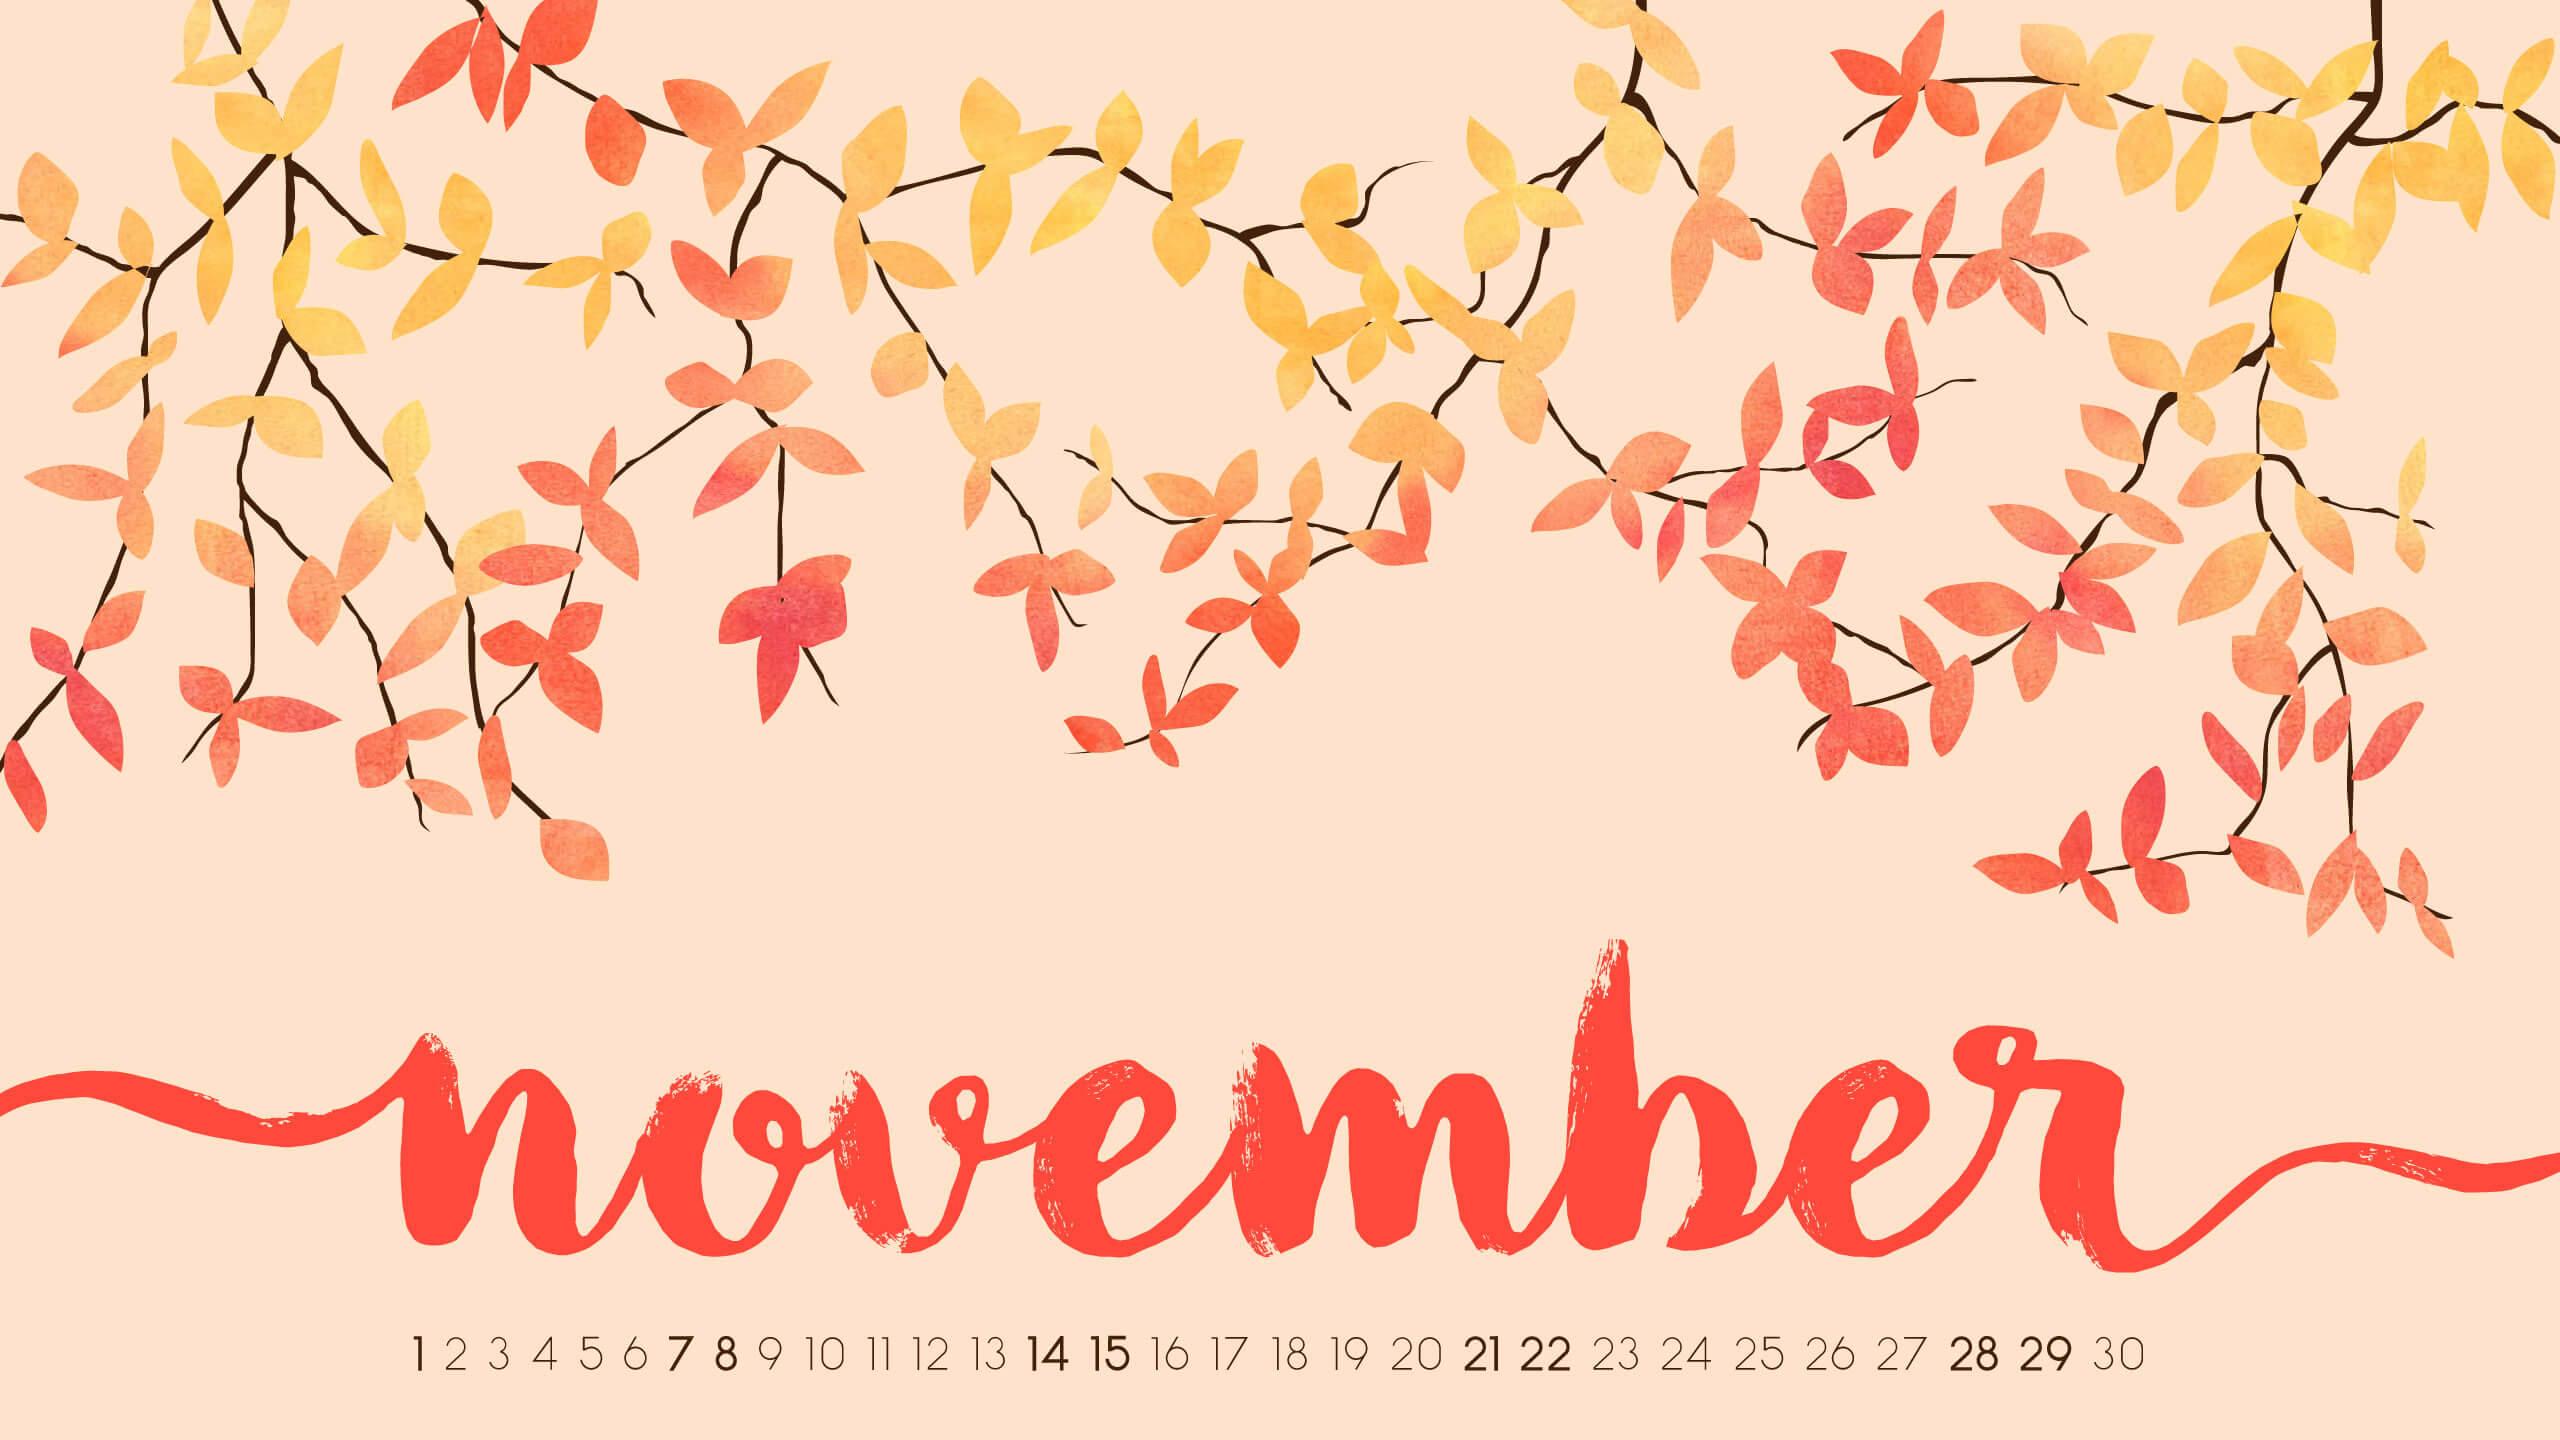 November 2020 Calendar HD Wallpaper